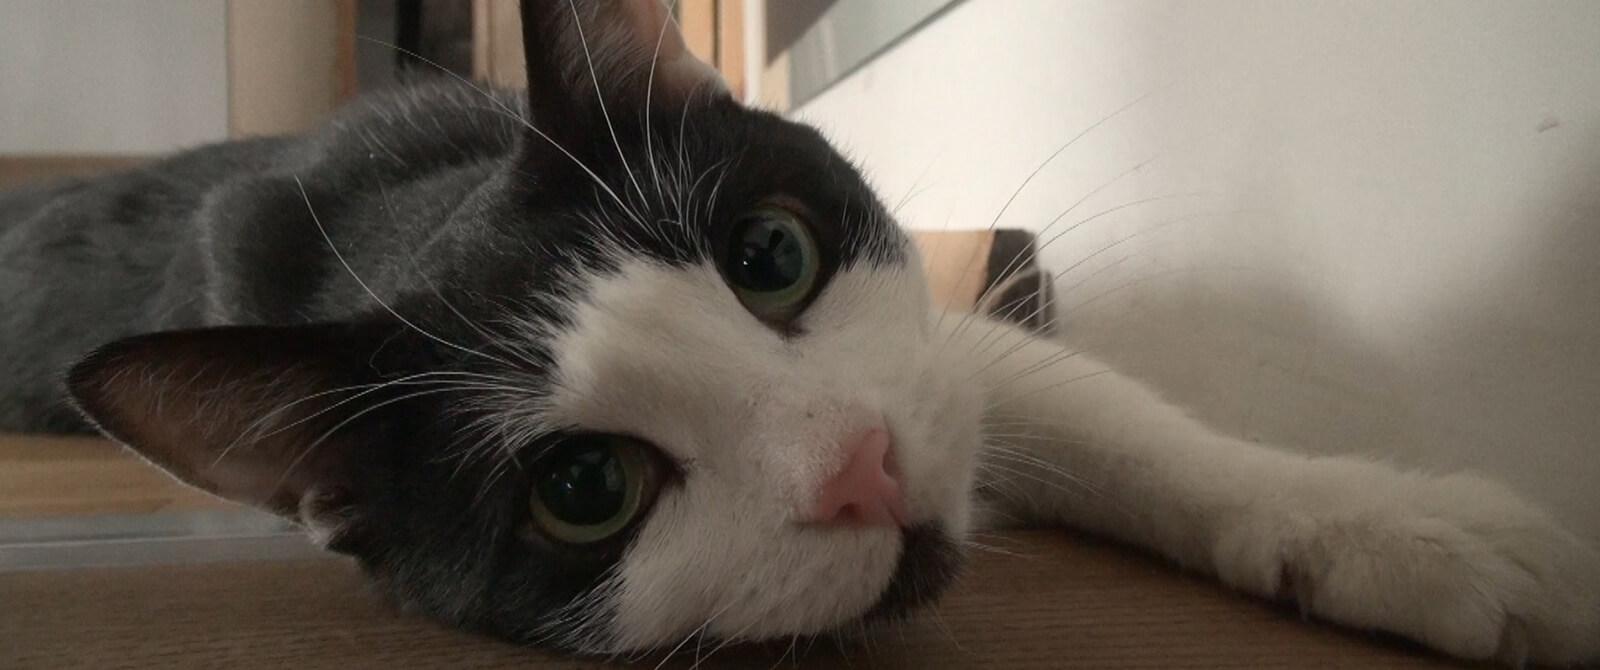 Katinas vardu Šeši